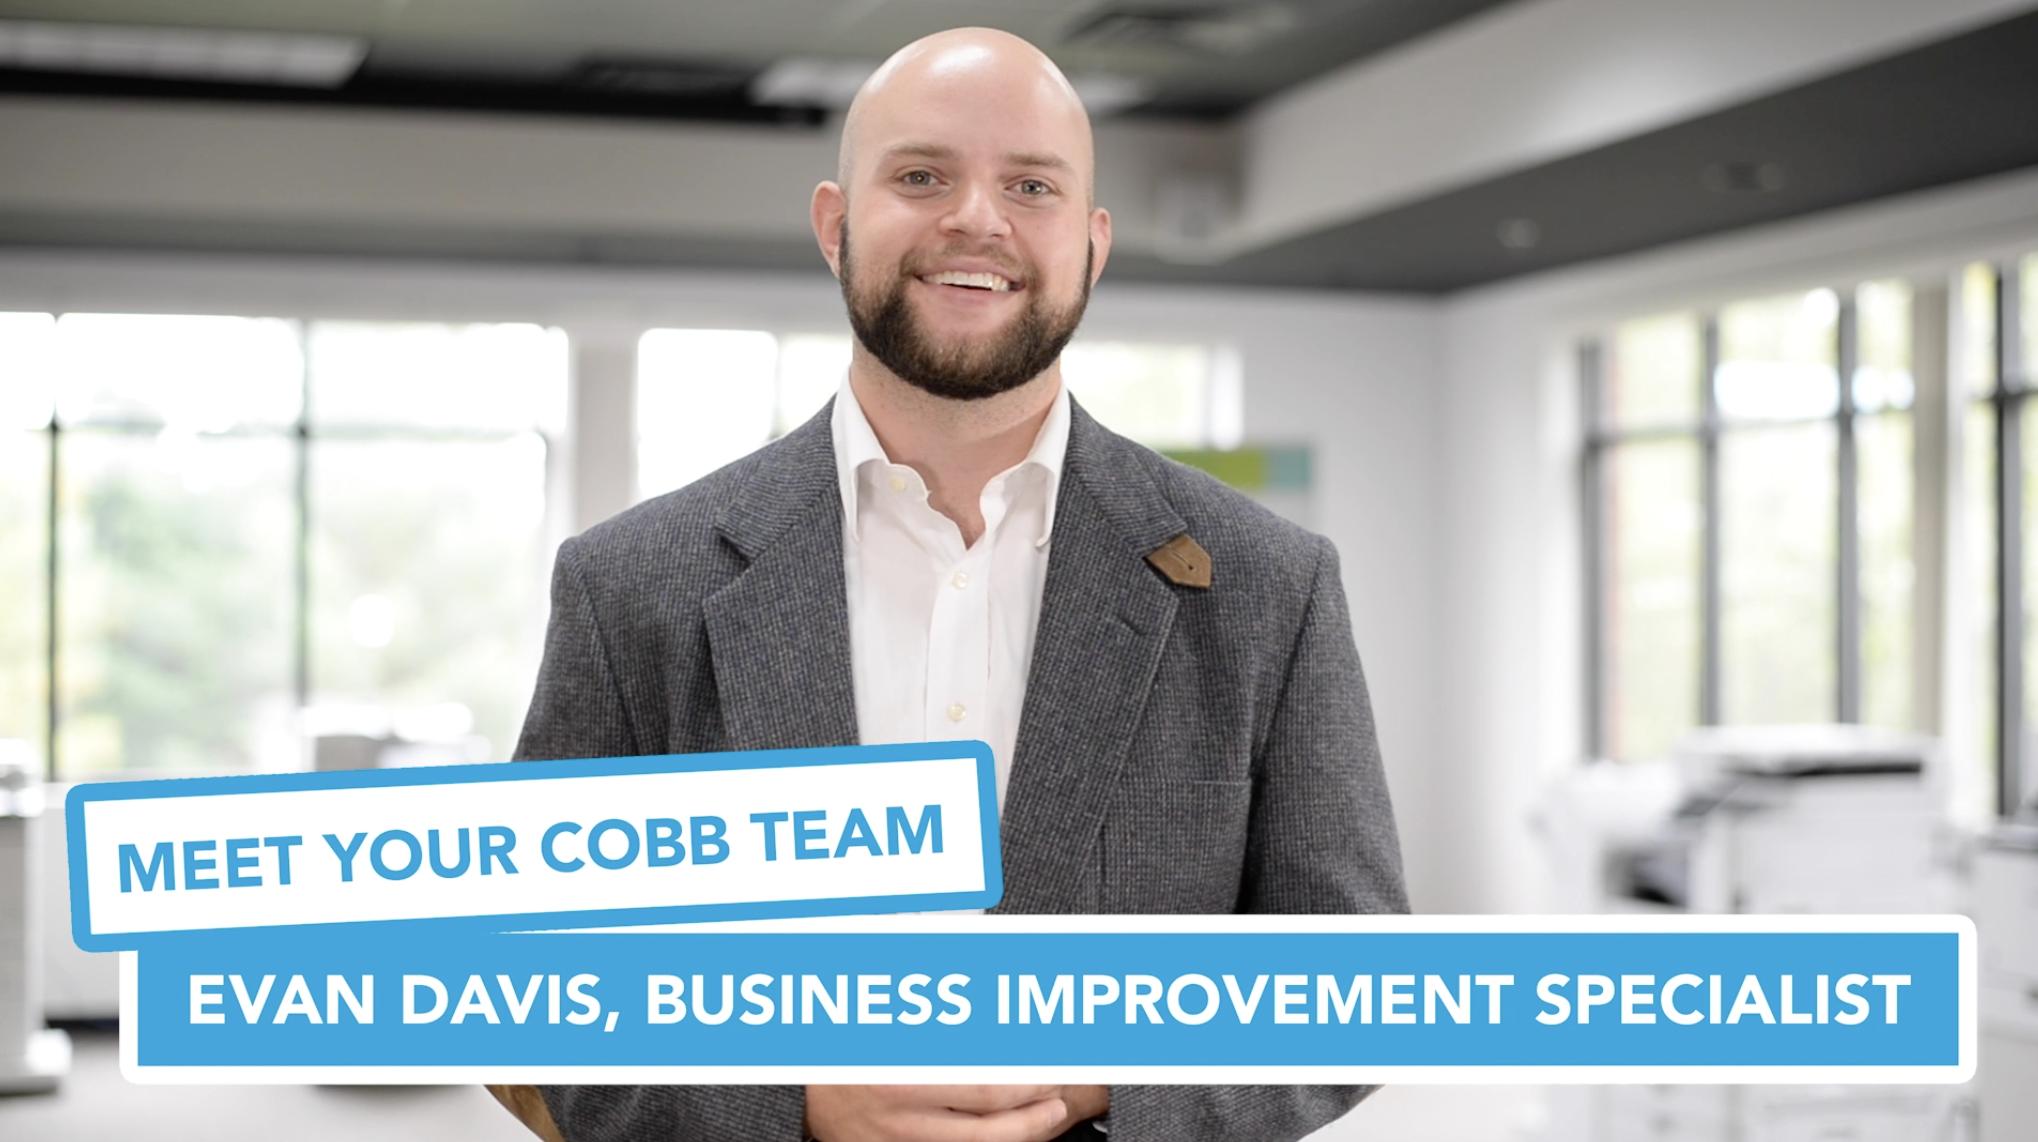 Meet Your Cobb Team Evan Davis, Business Improvement Specialist